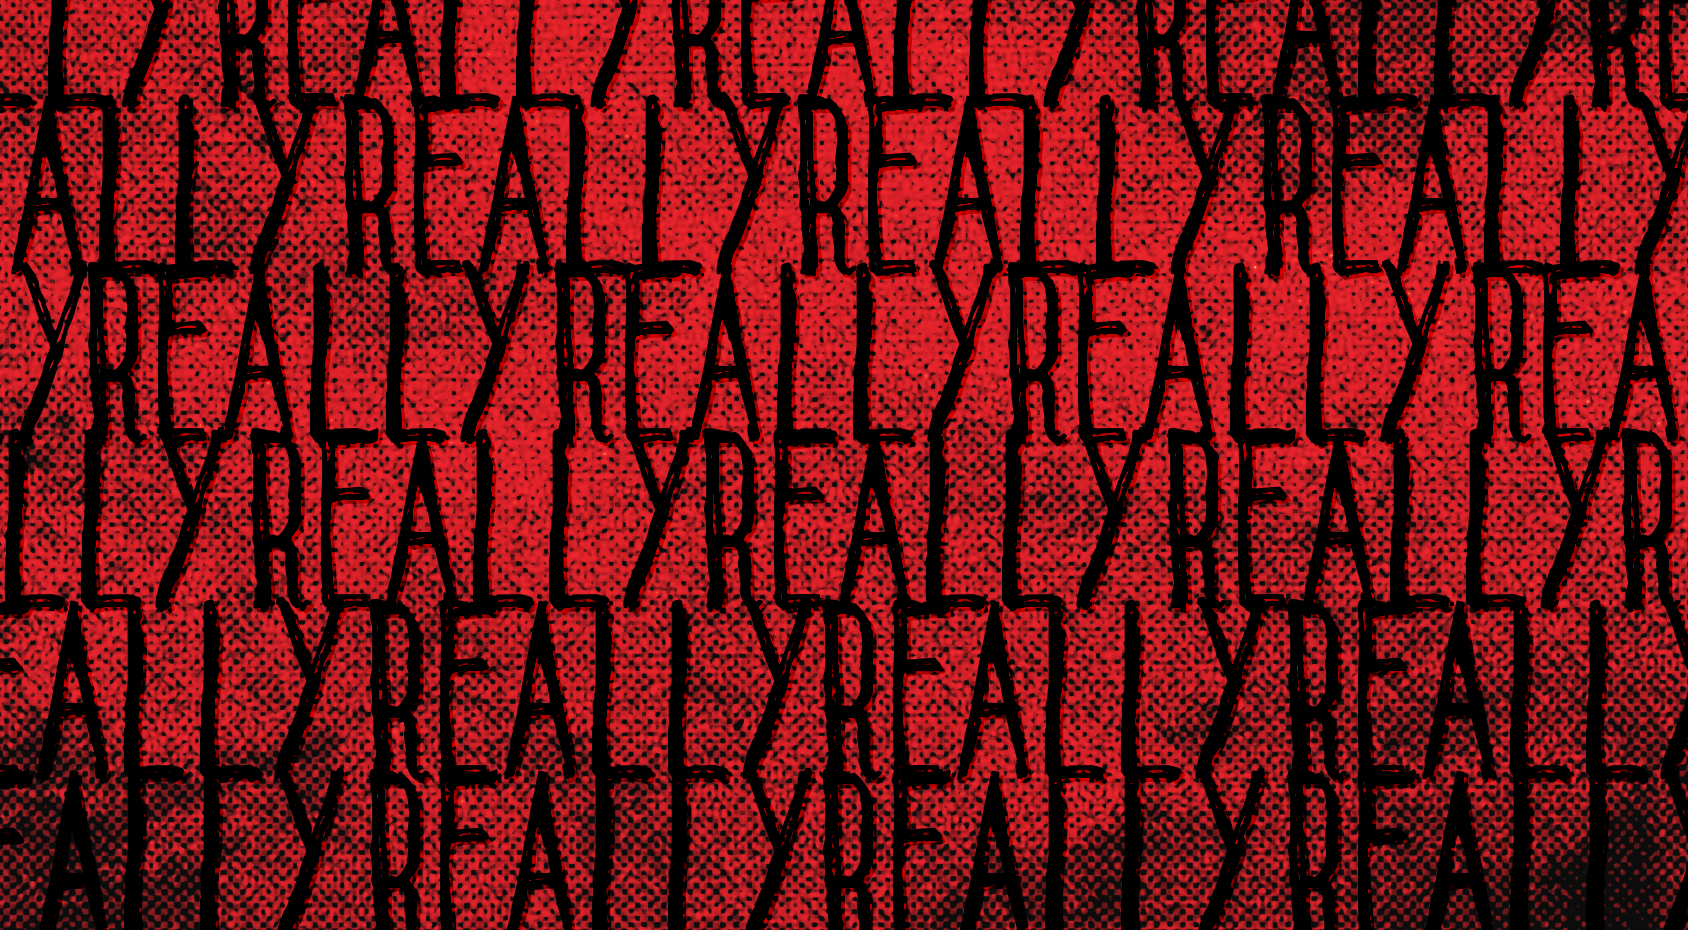 Really-Really_background.jpg